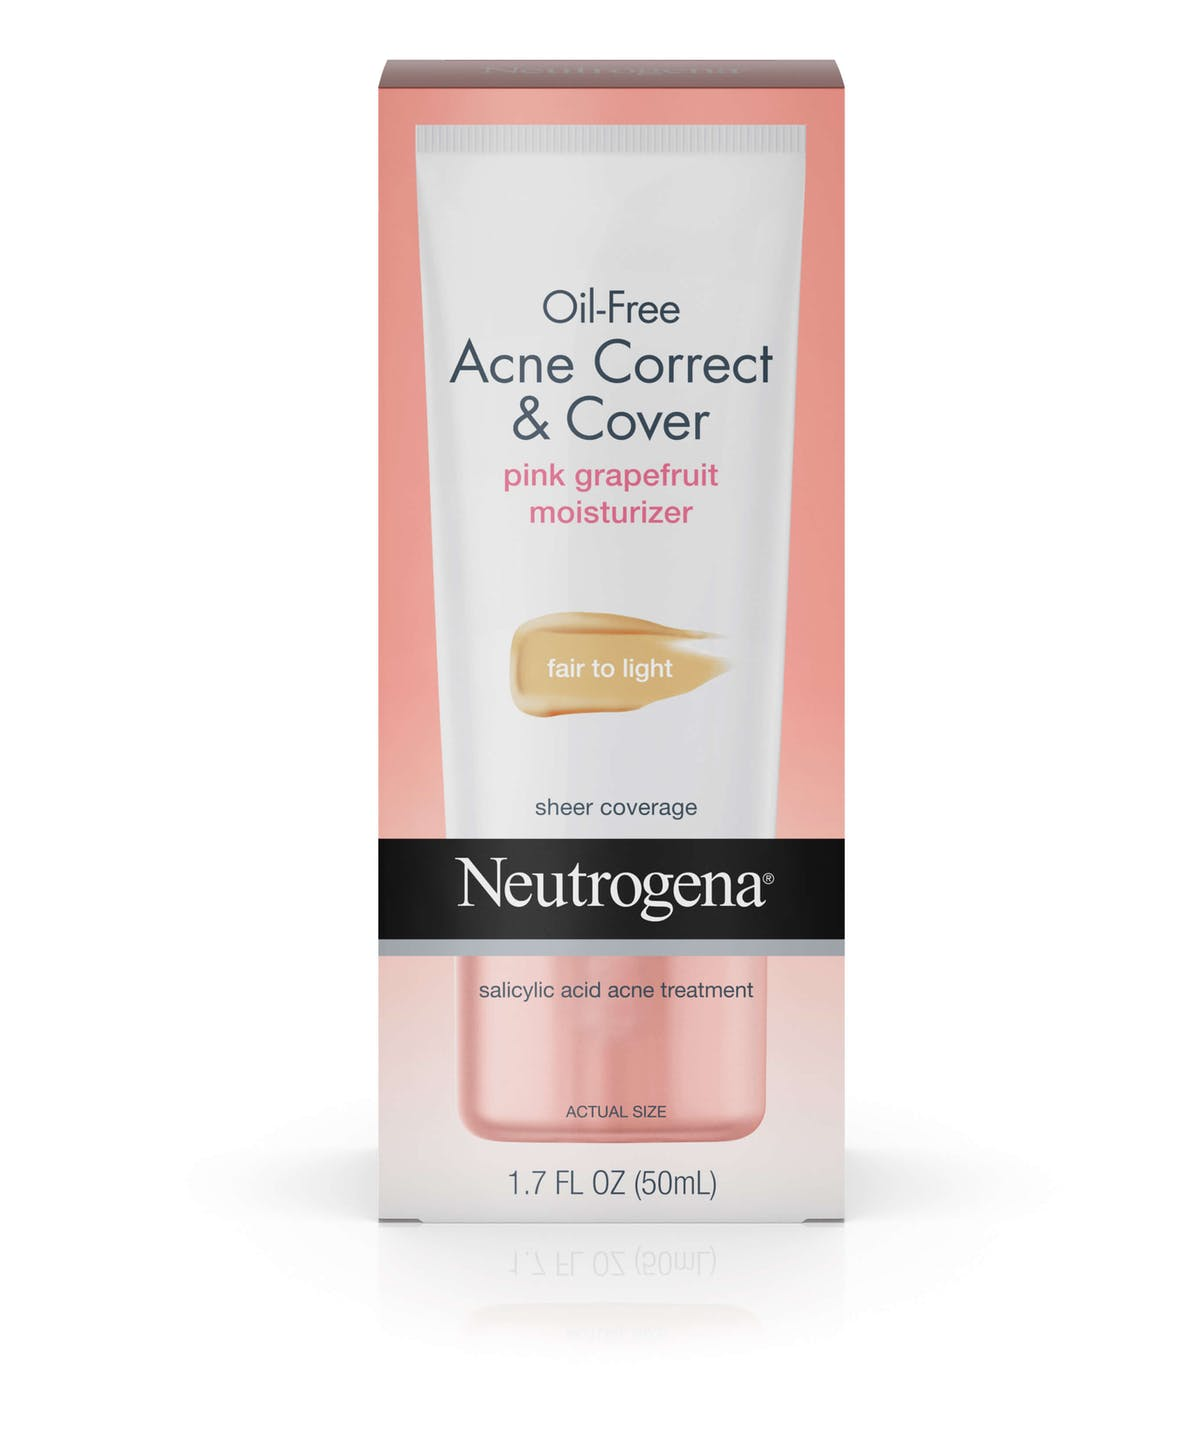 Oil Free Acne Correct Cover Pink Grapefruit Moisturizer Neutrogena